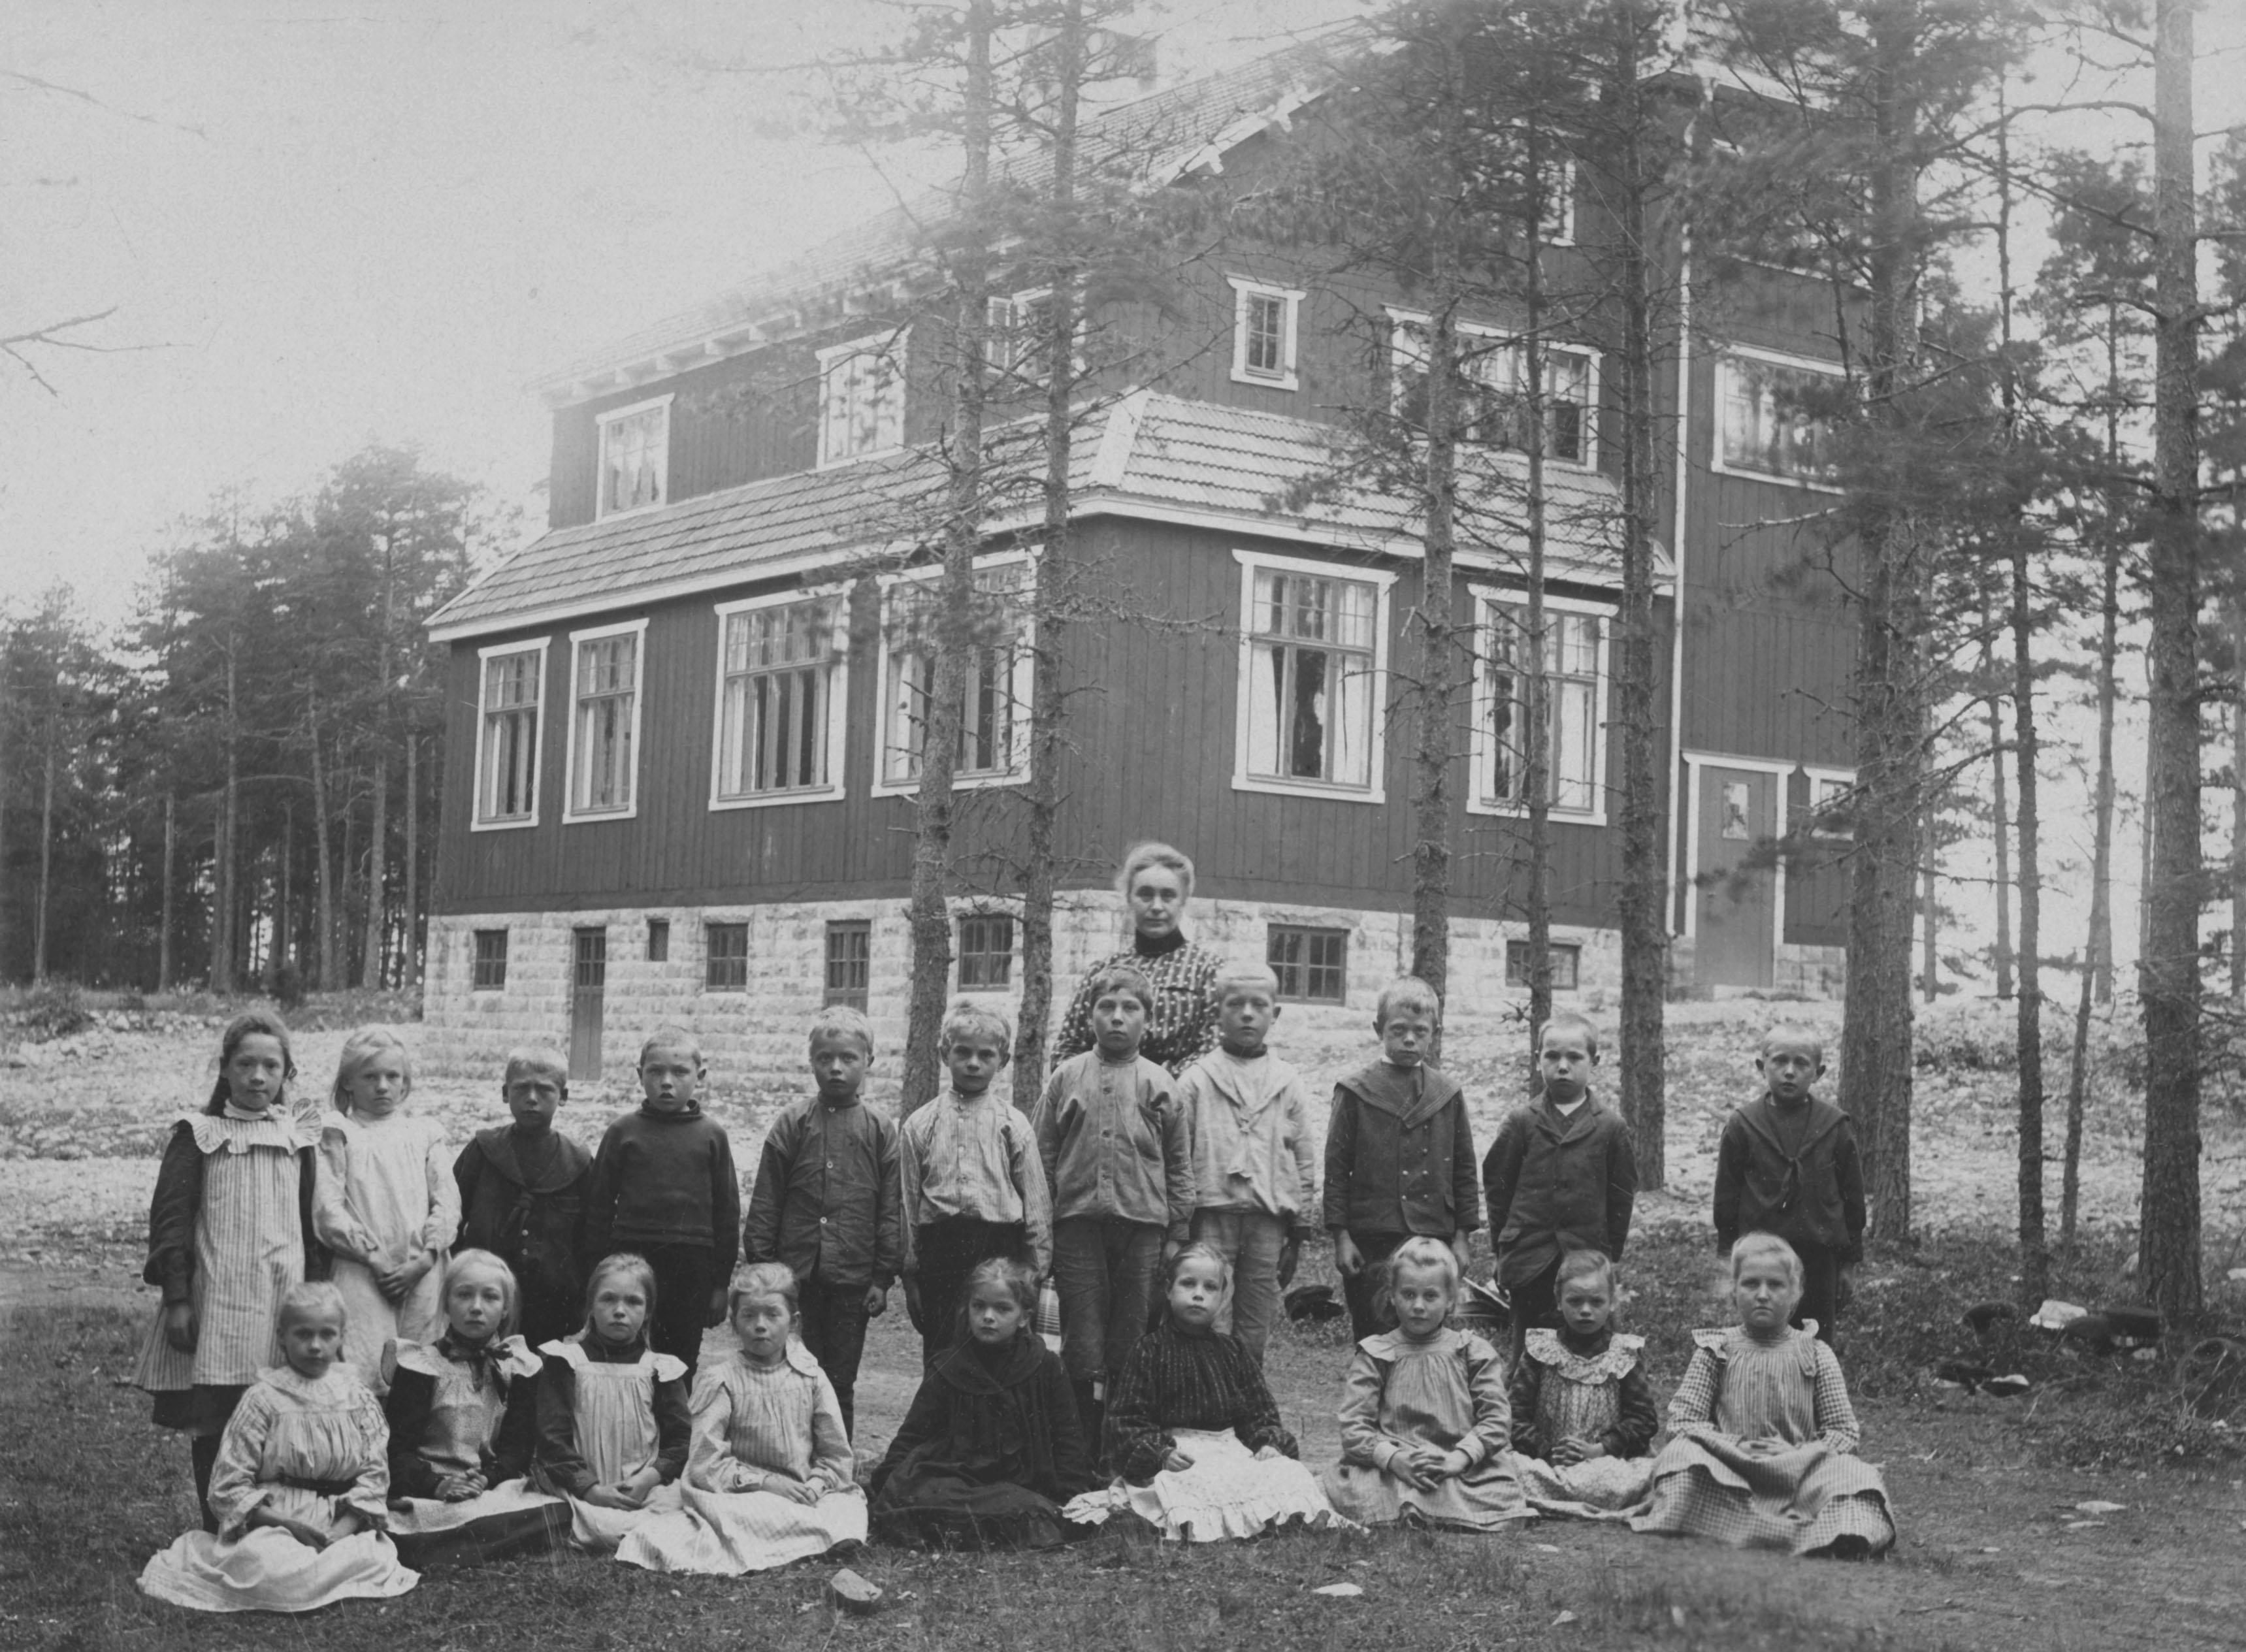 Norrmalms Fotografiatelier, Stockholm, Mackmyra skola. ca 1905.